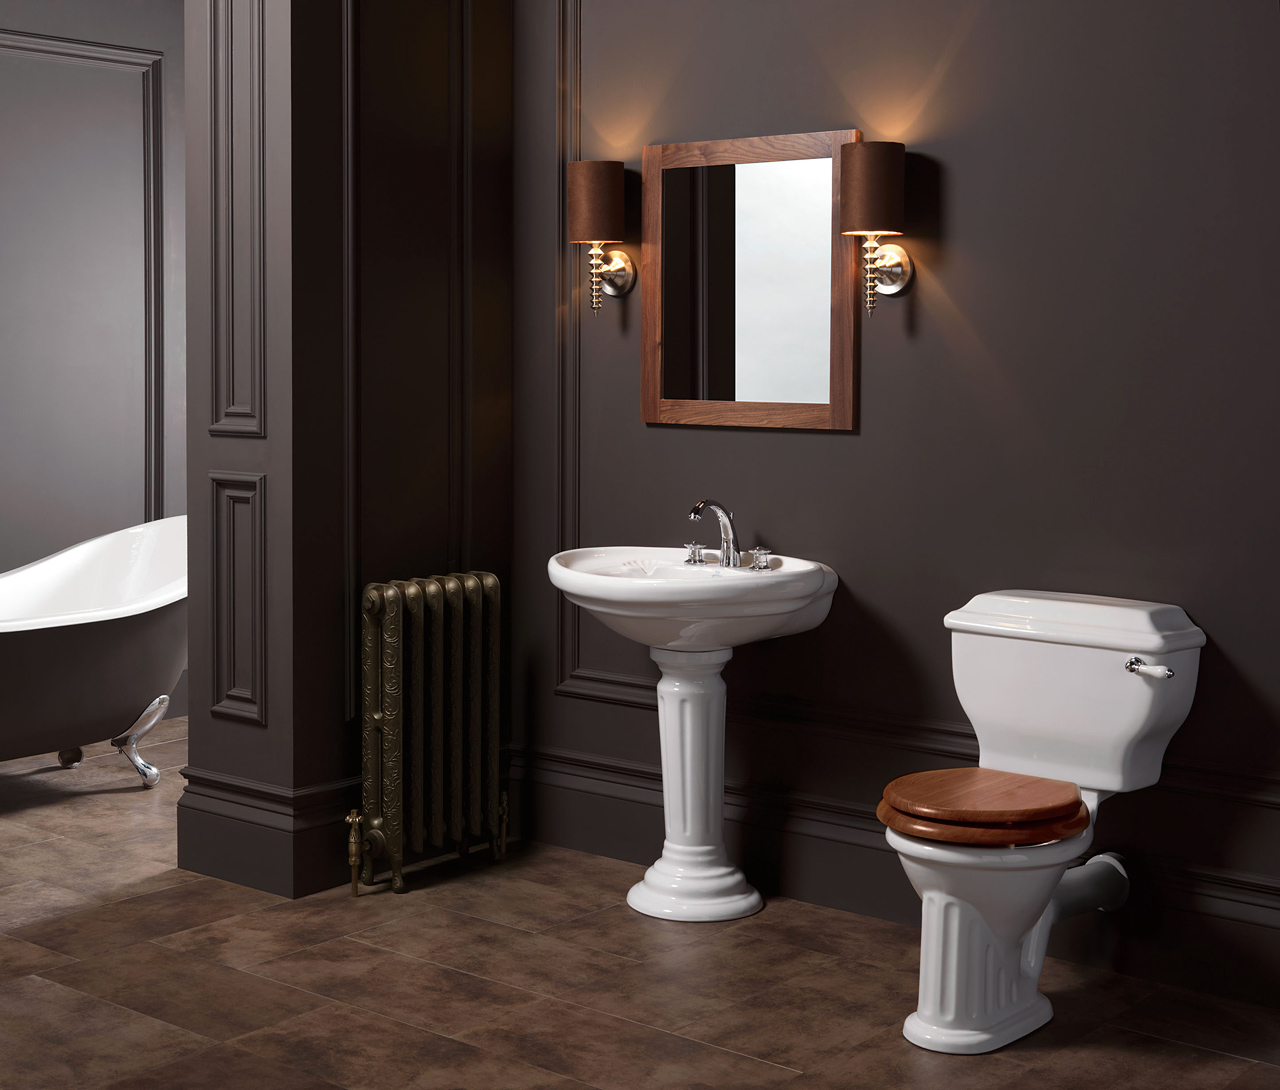 Classic Bathrooms: Imperial Bathrooms - Windsor-Main-Room+Radiator-Retouch